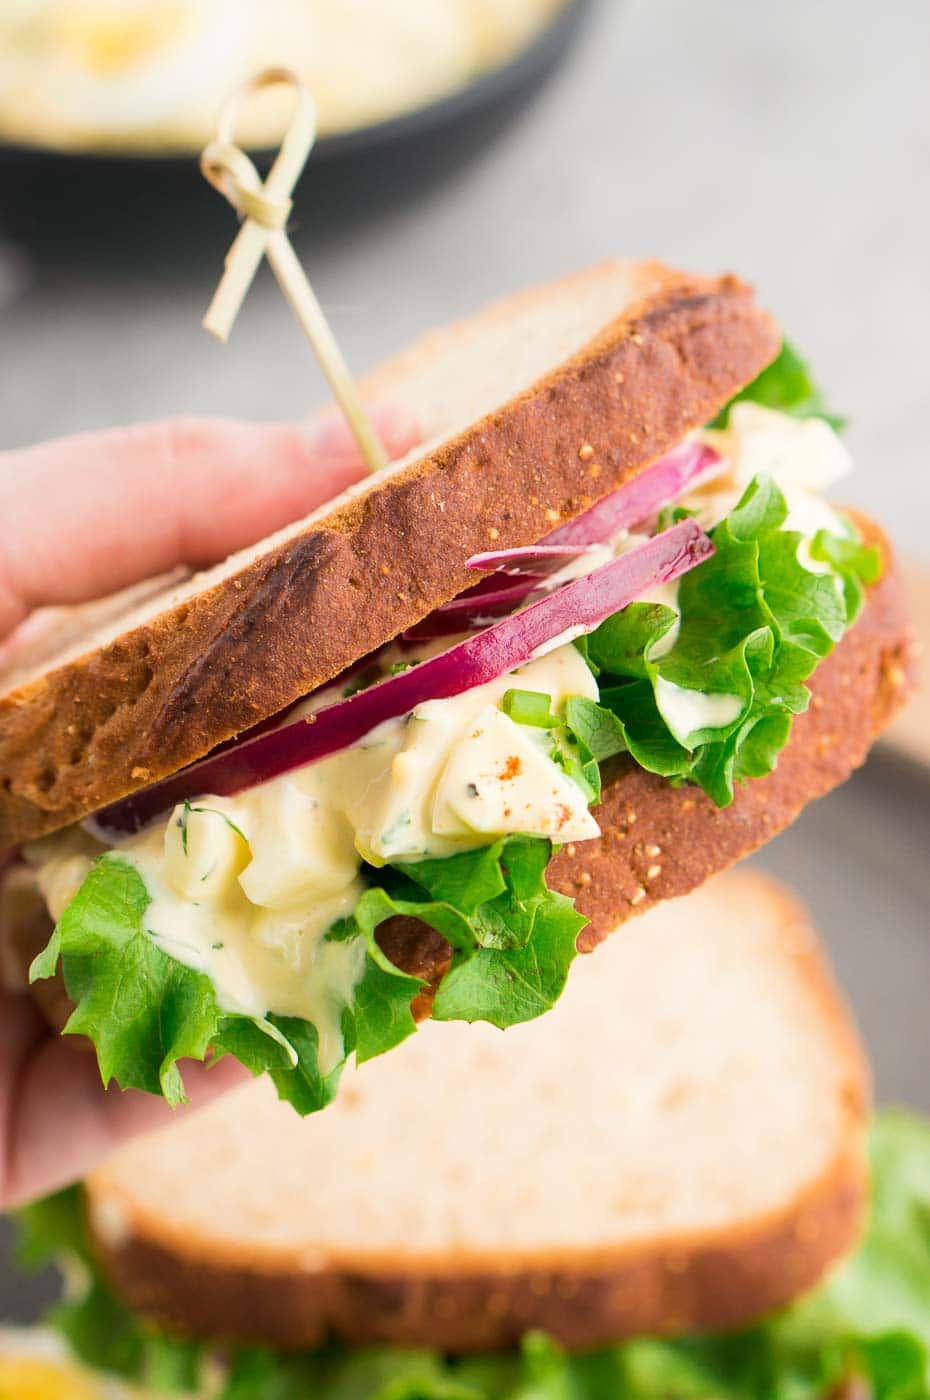 holding a sandwich